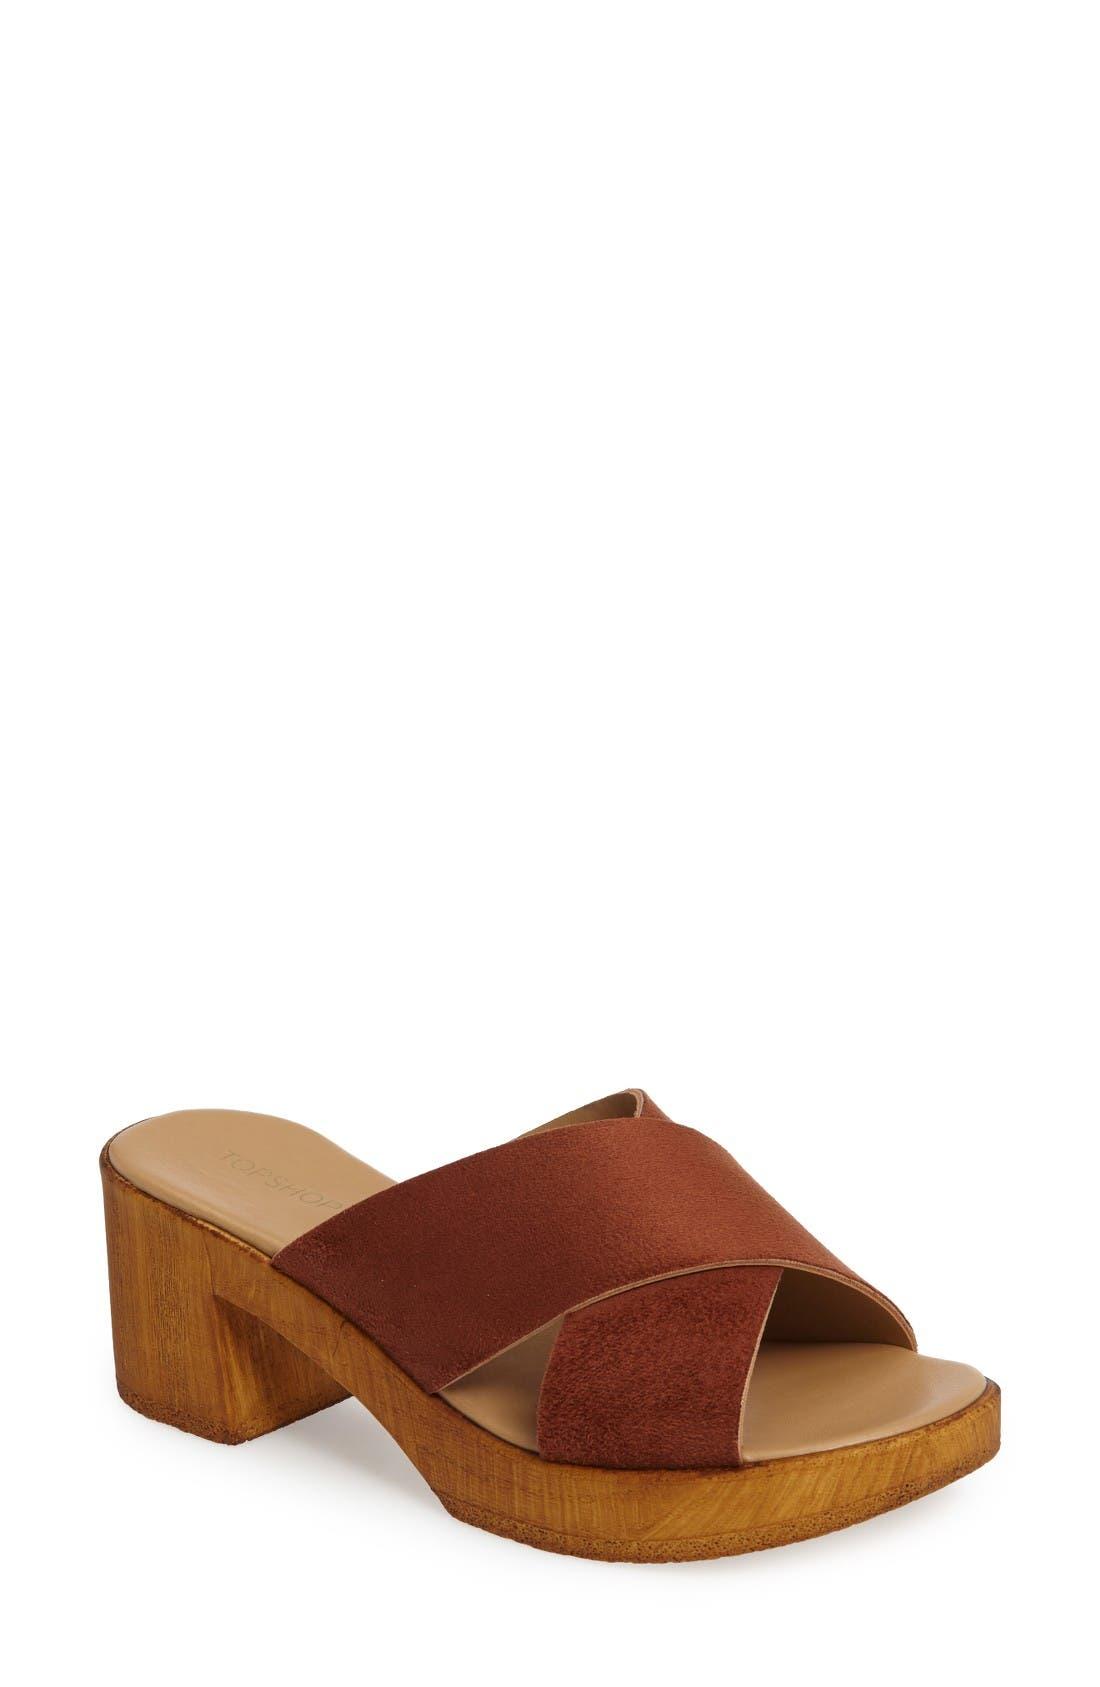 Alternate Image 1 Selected - Topshop Dixy Clog Sandal (Women)